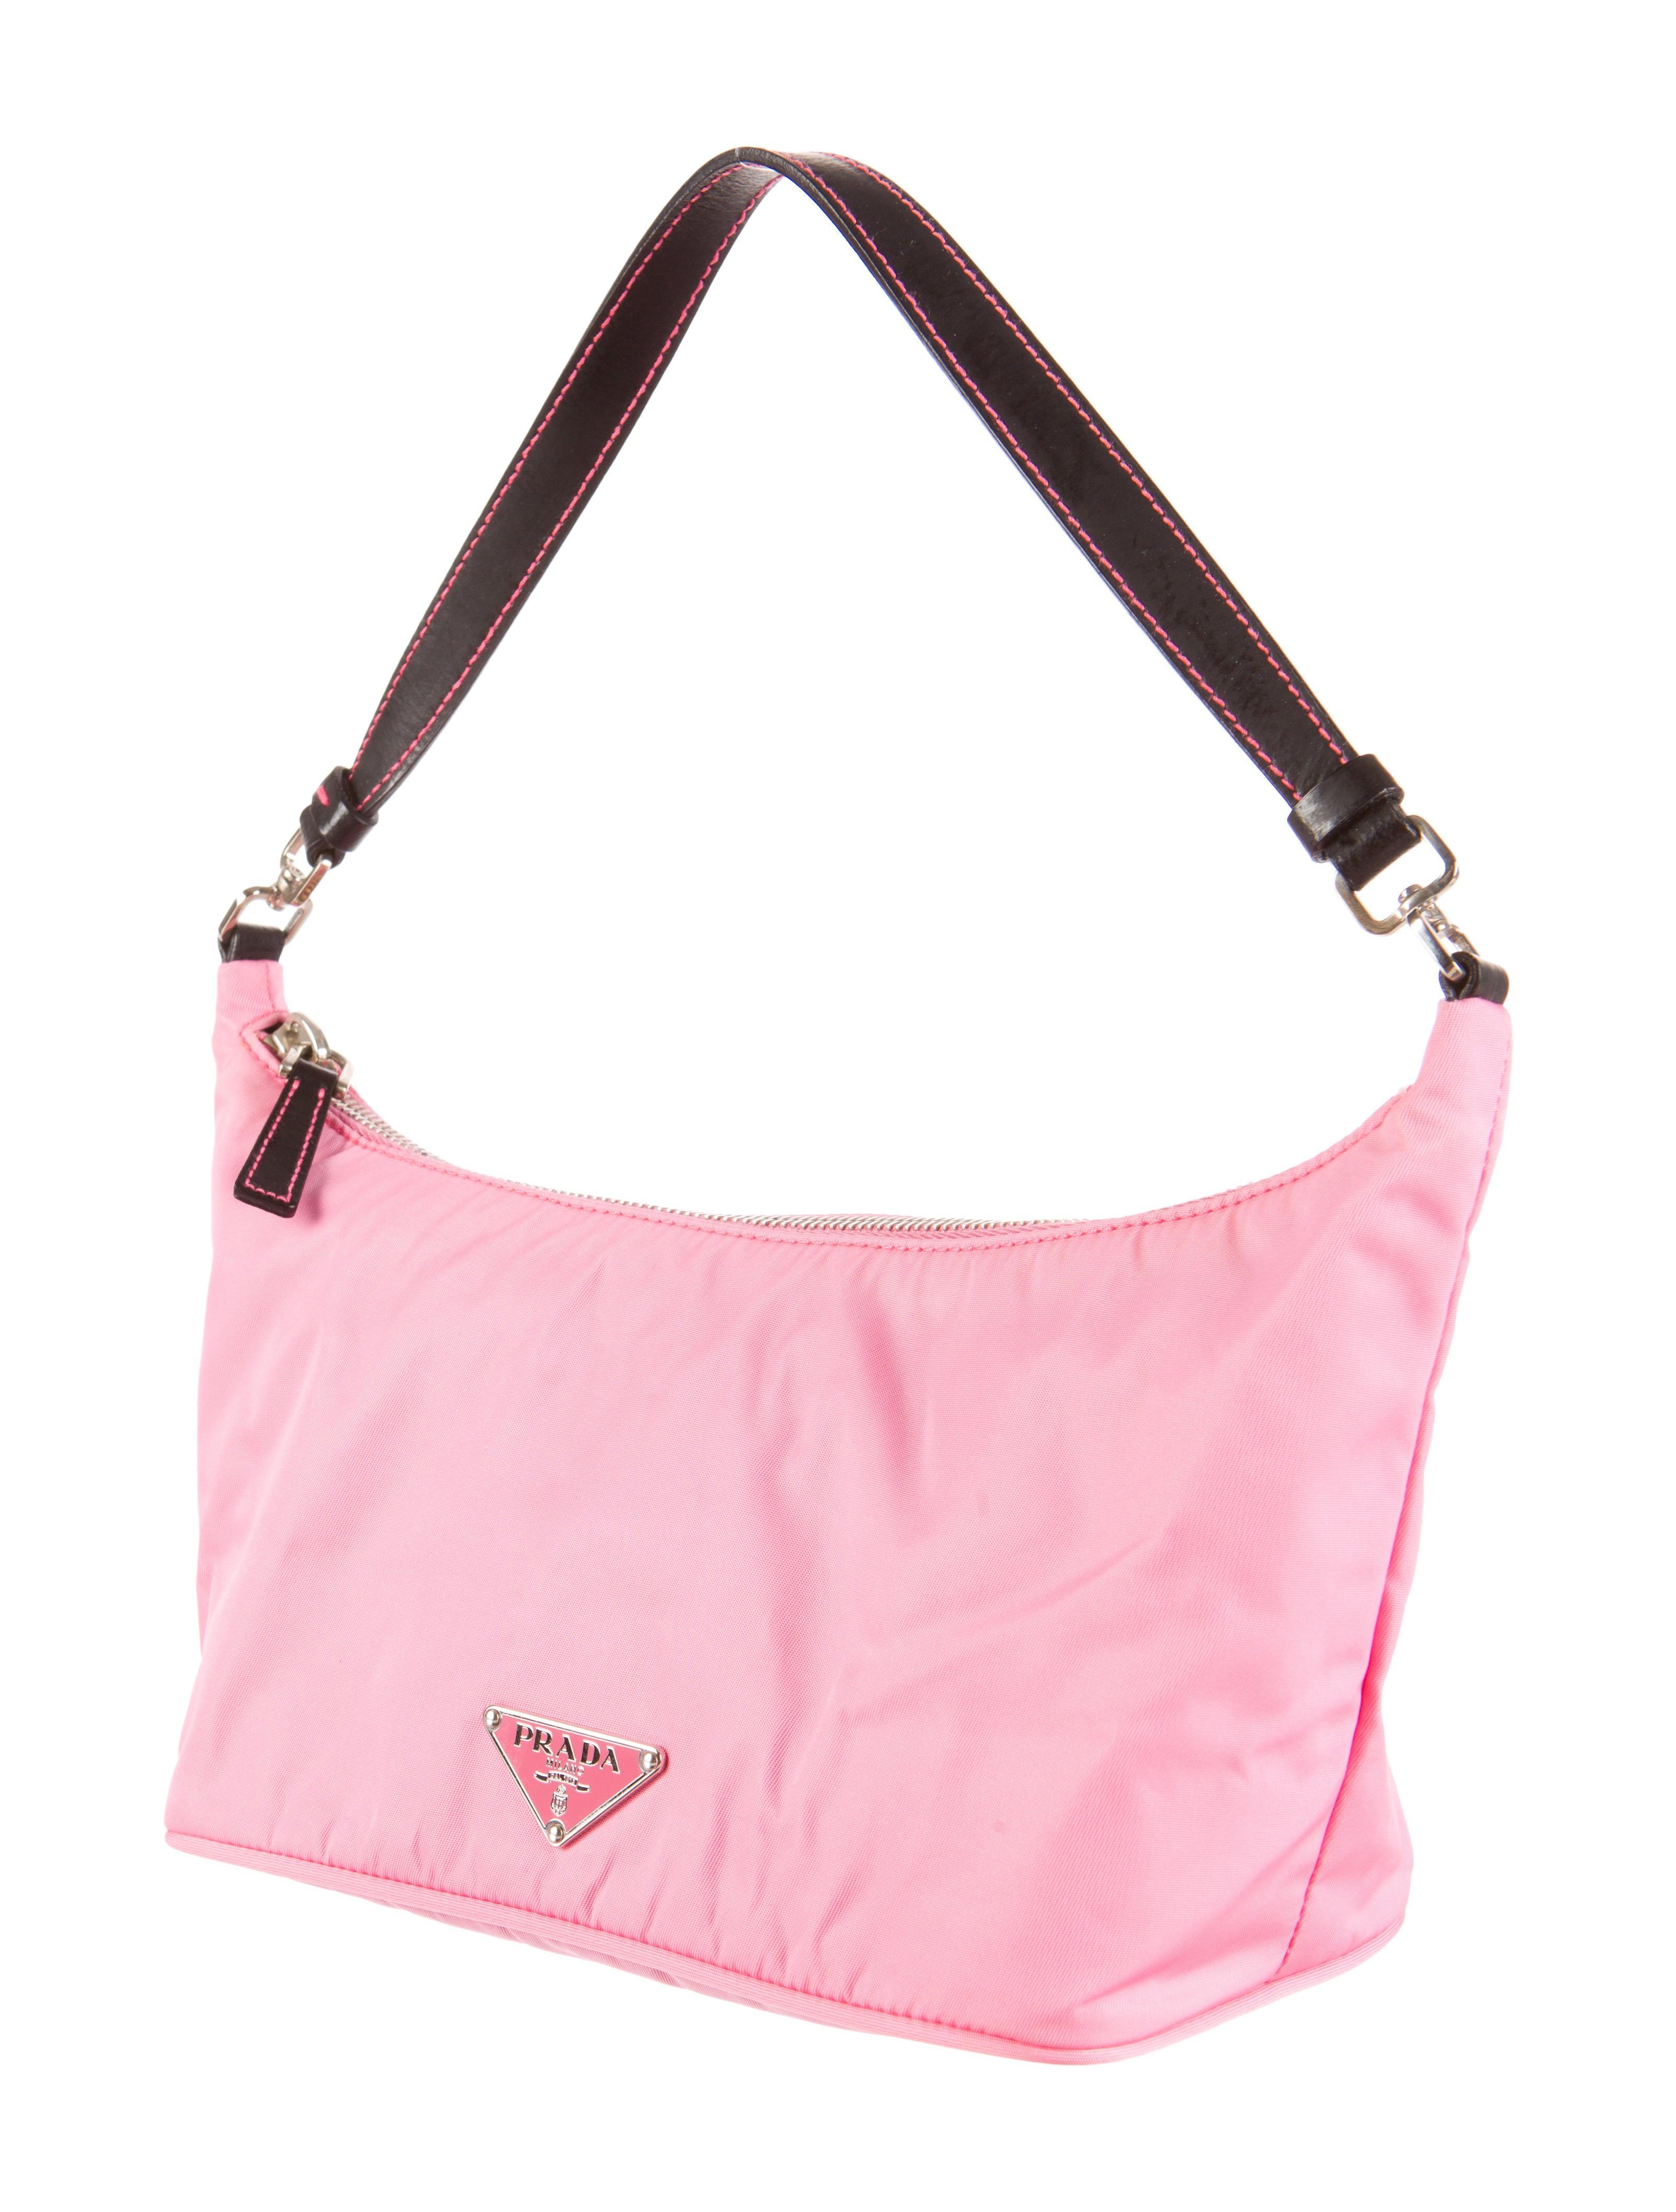 prada tessuto small handle bag